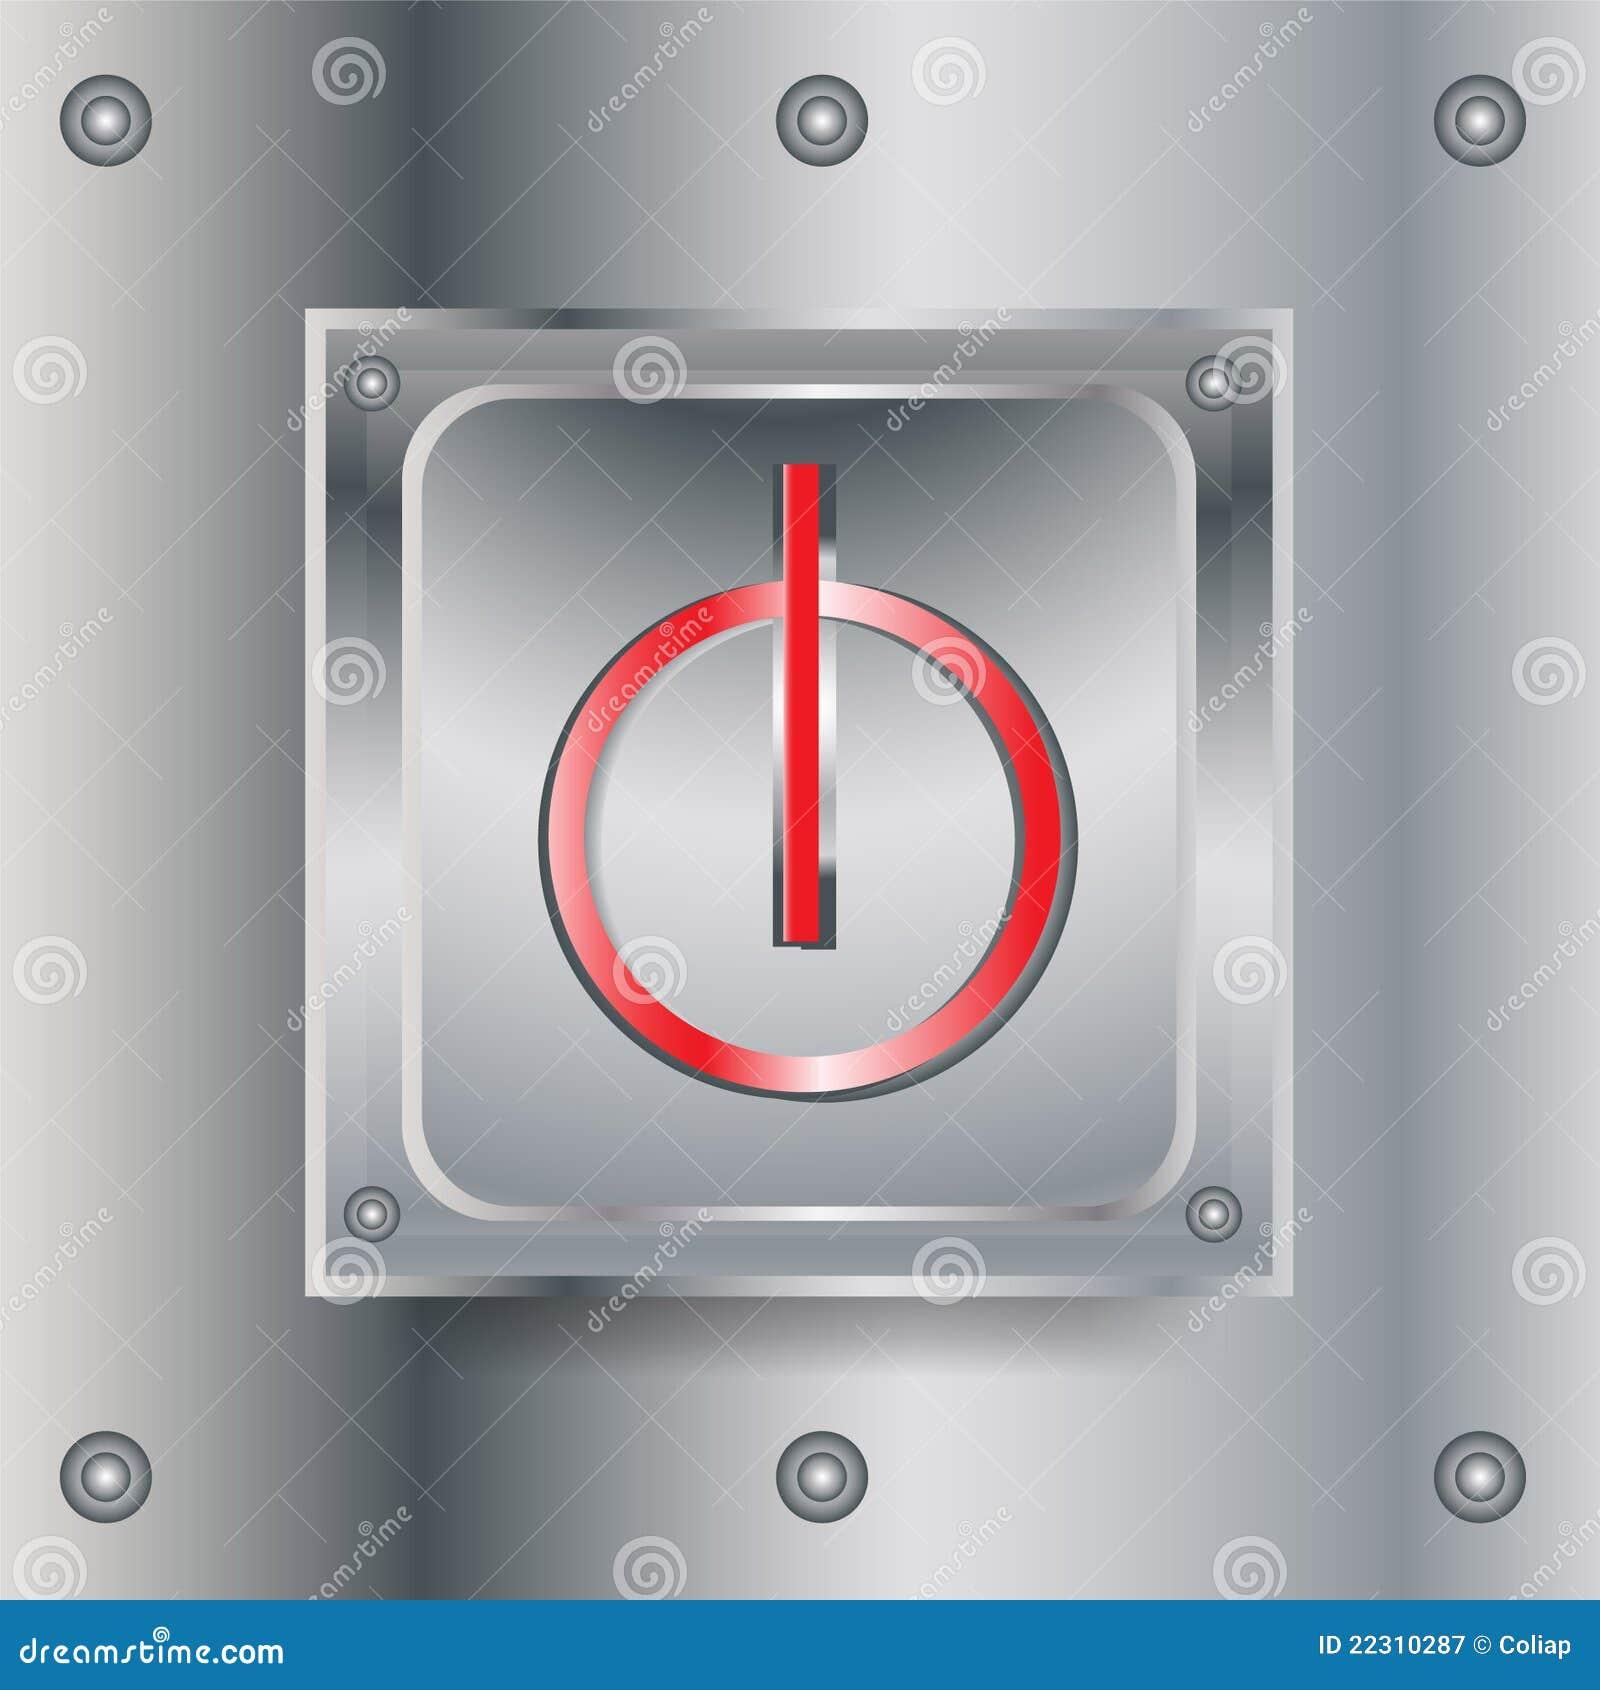 Off switch metallic button